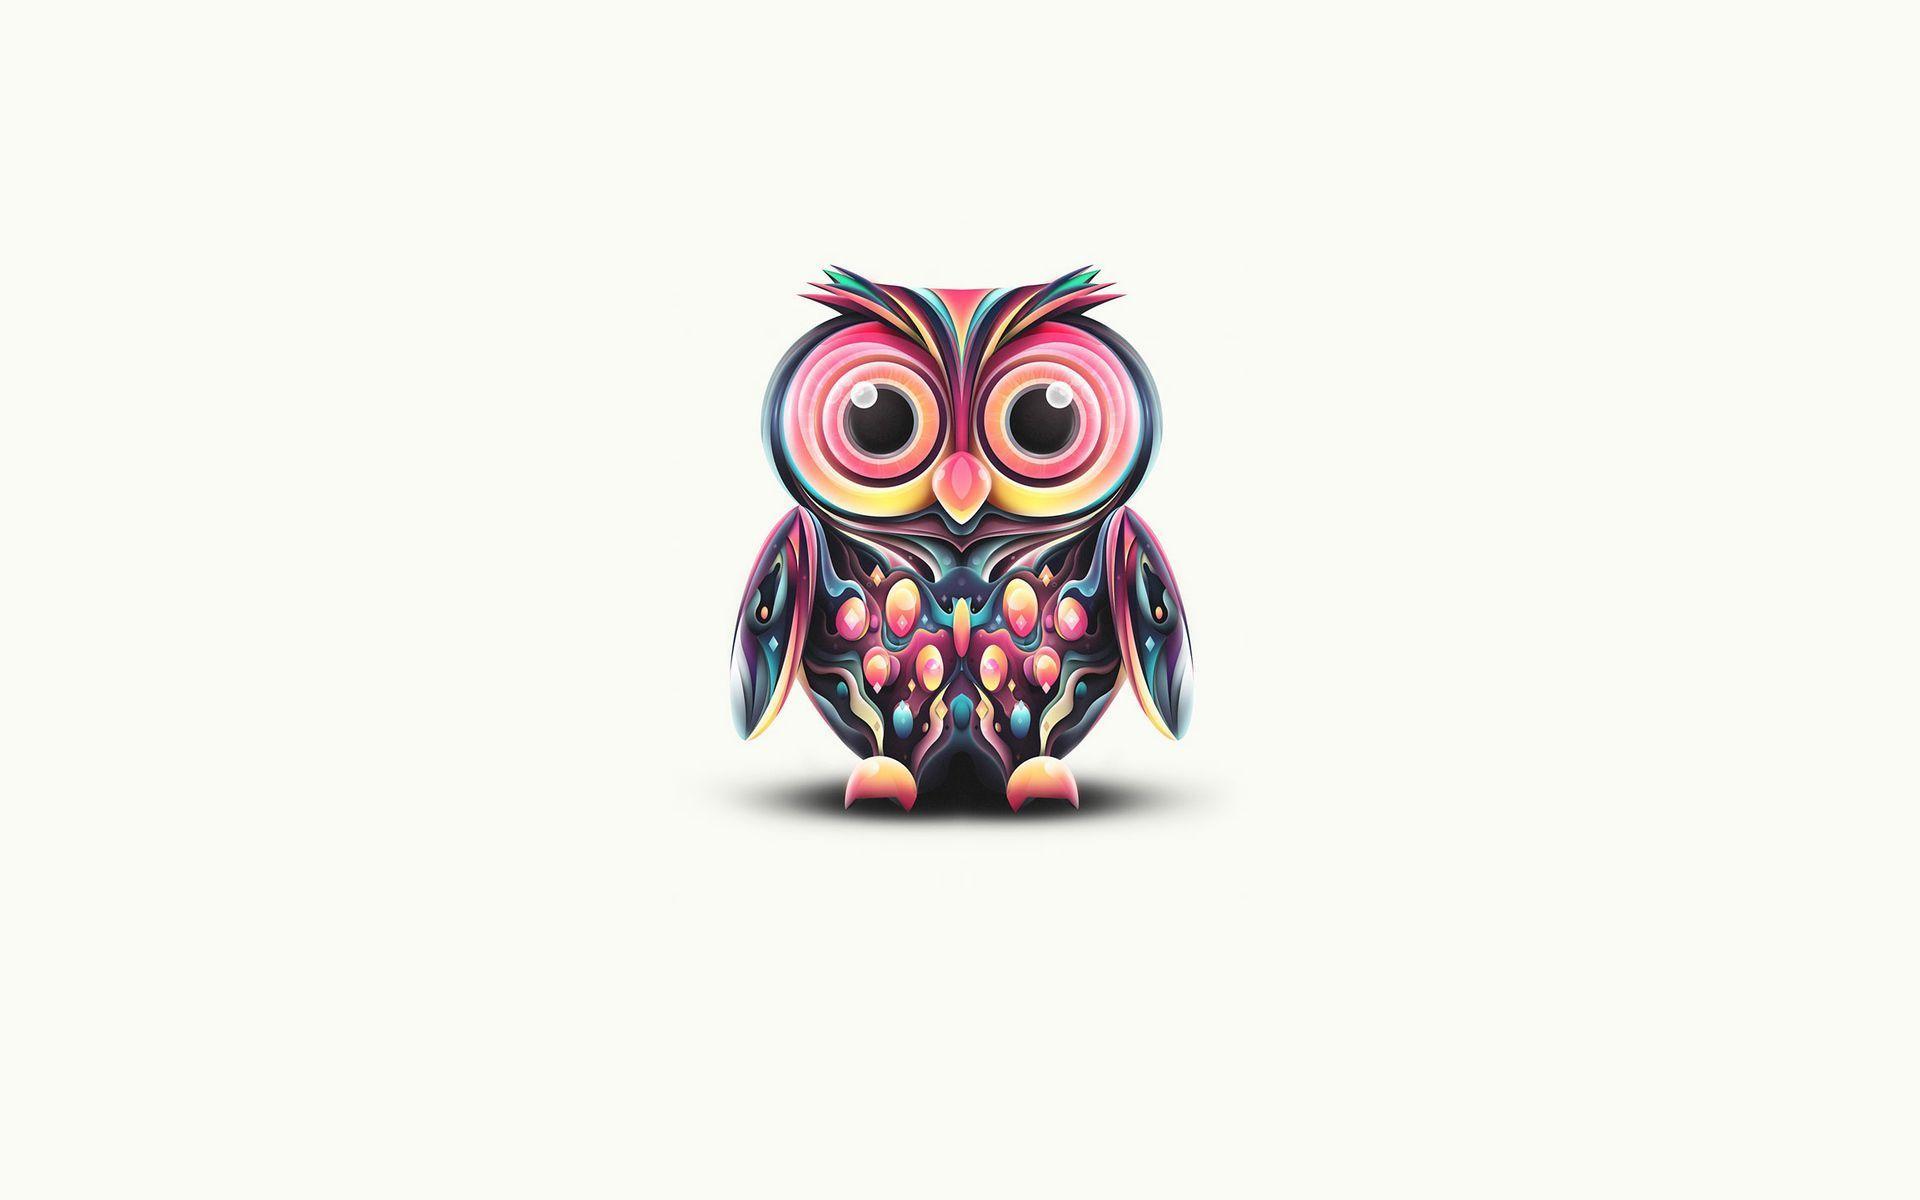 40156665 Cute Owl Wallpapers